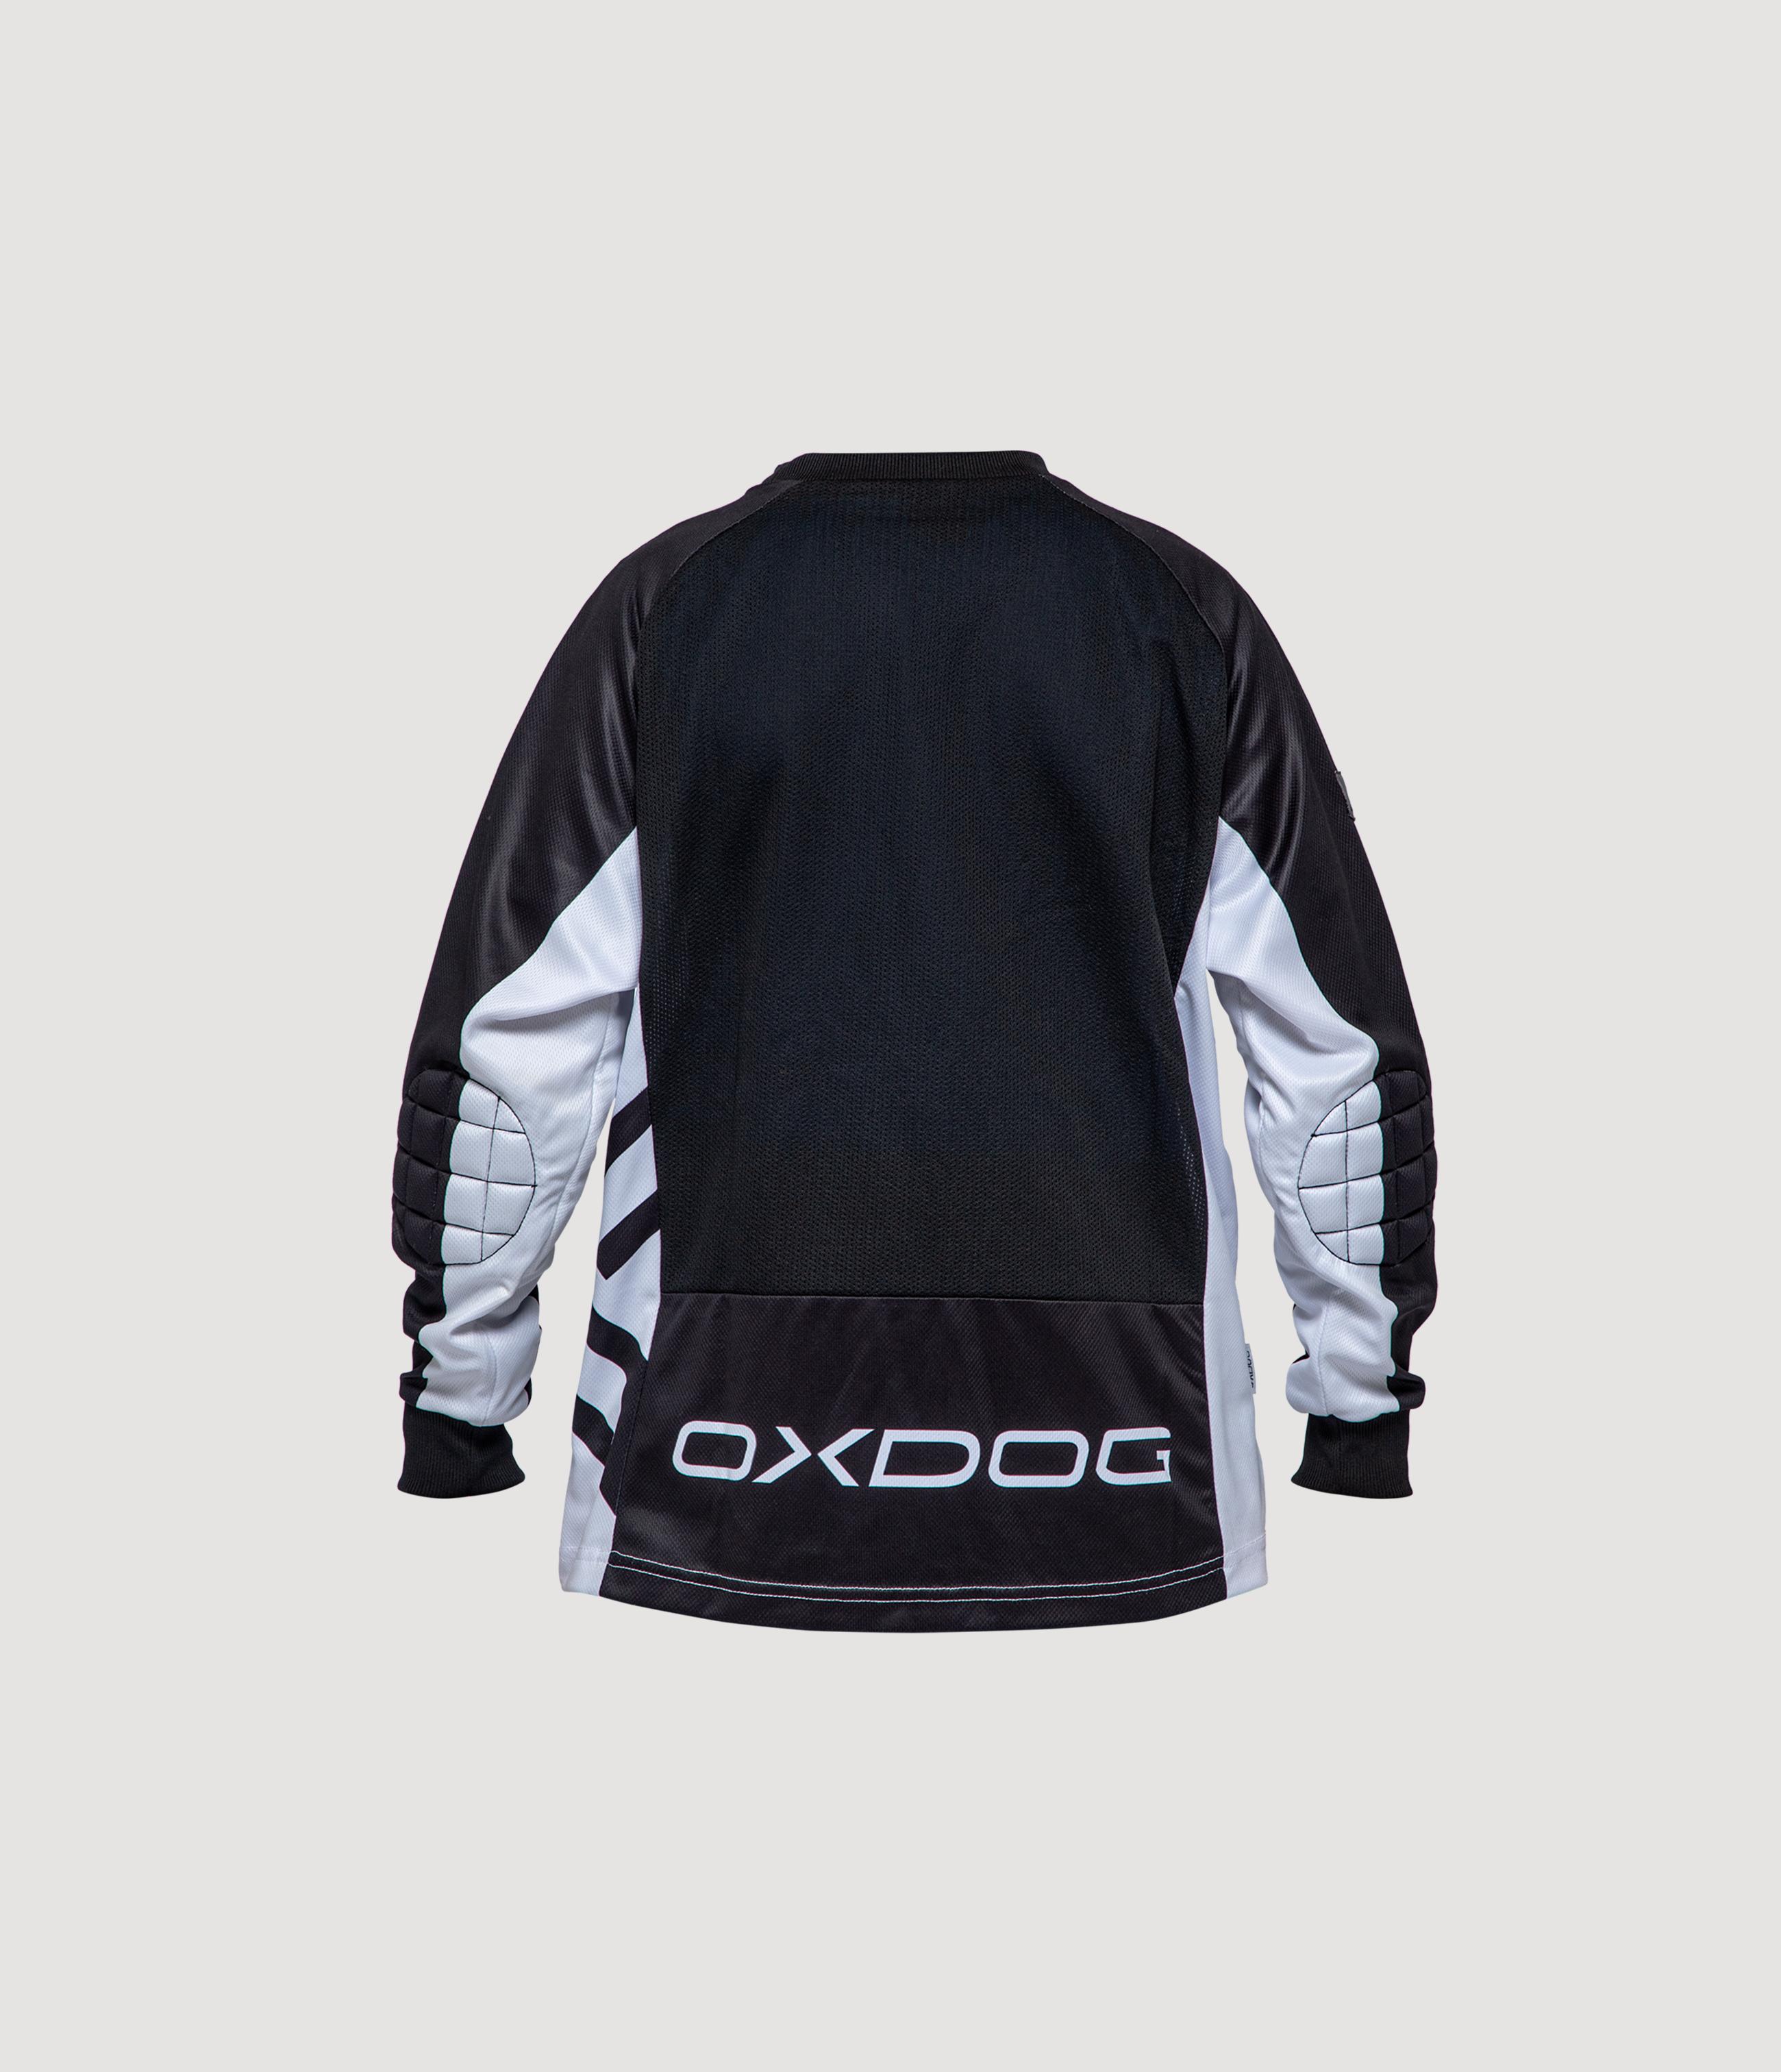 XGuard Goalie Shirt JR Back